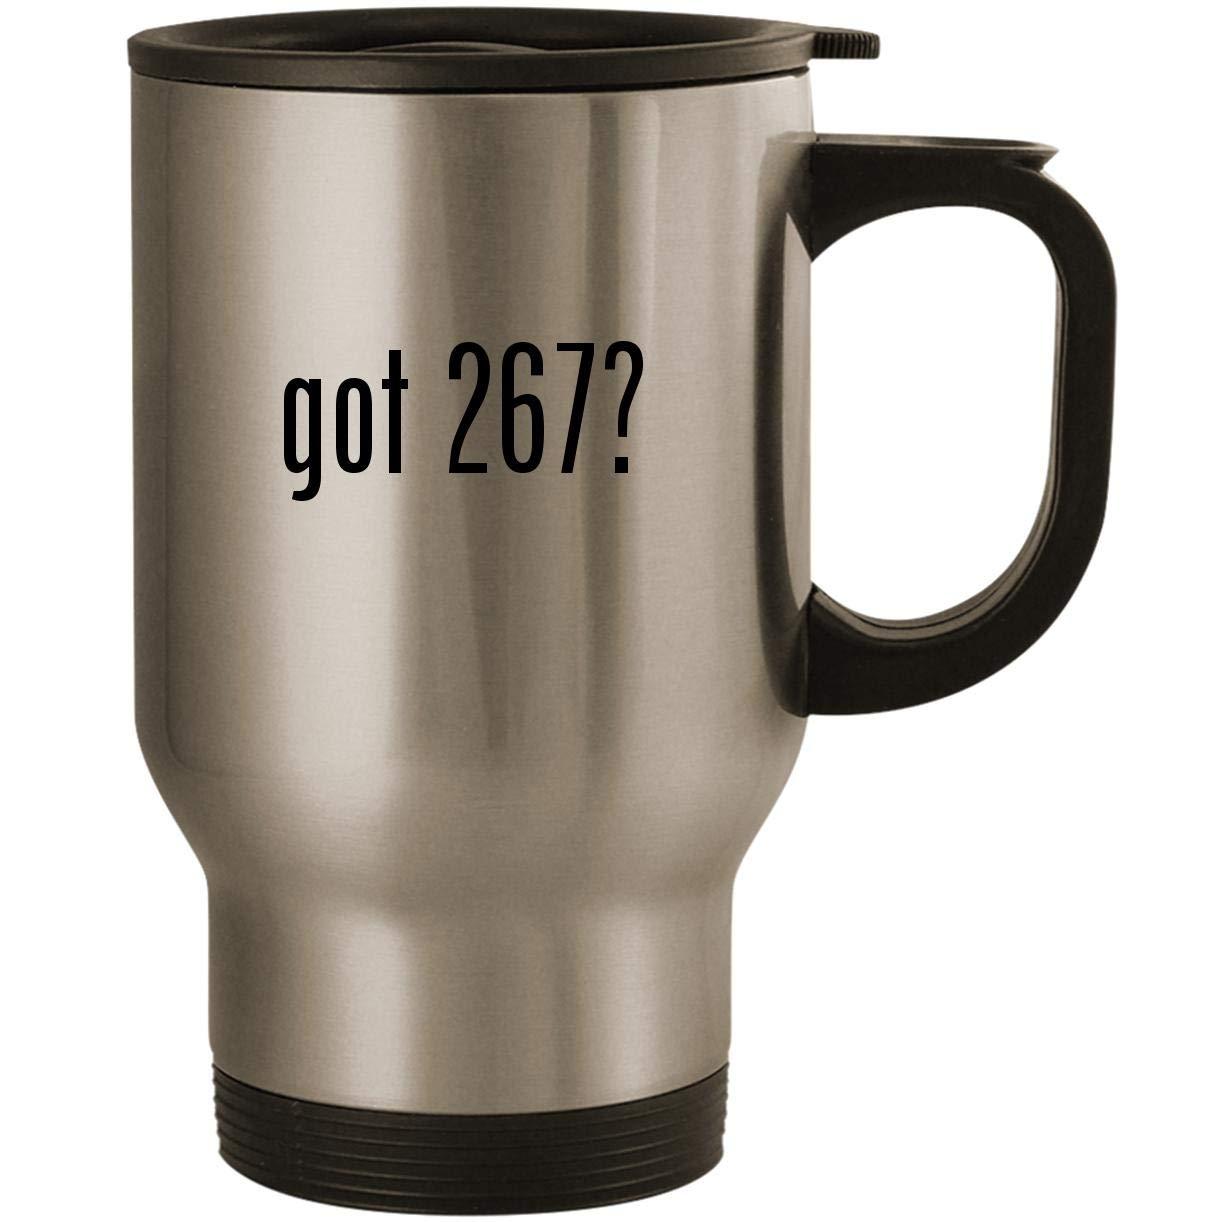 got 267? - Stainless Steel 14oz Road Ready Travel Mug, Silver